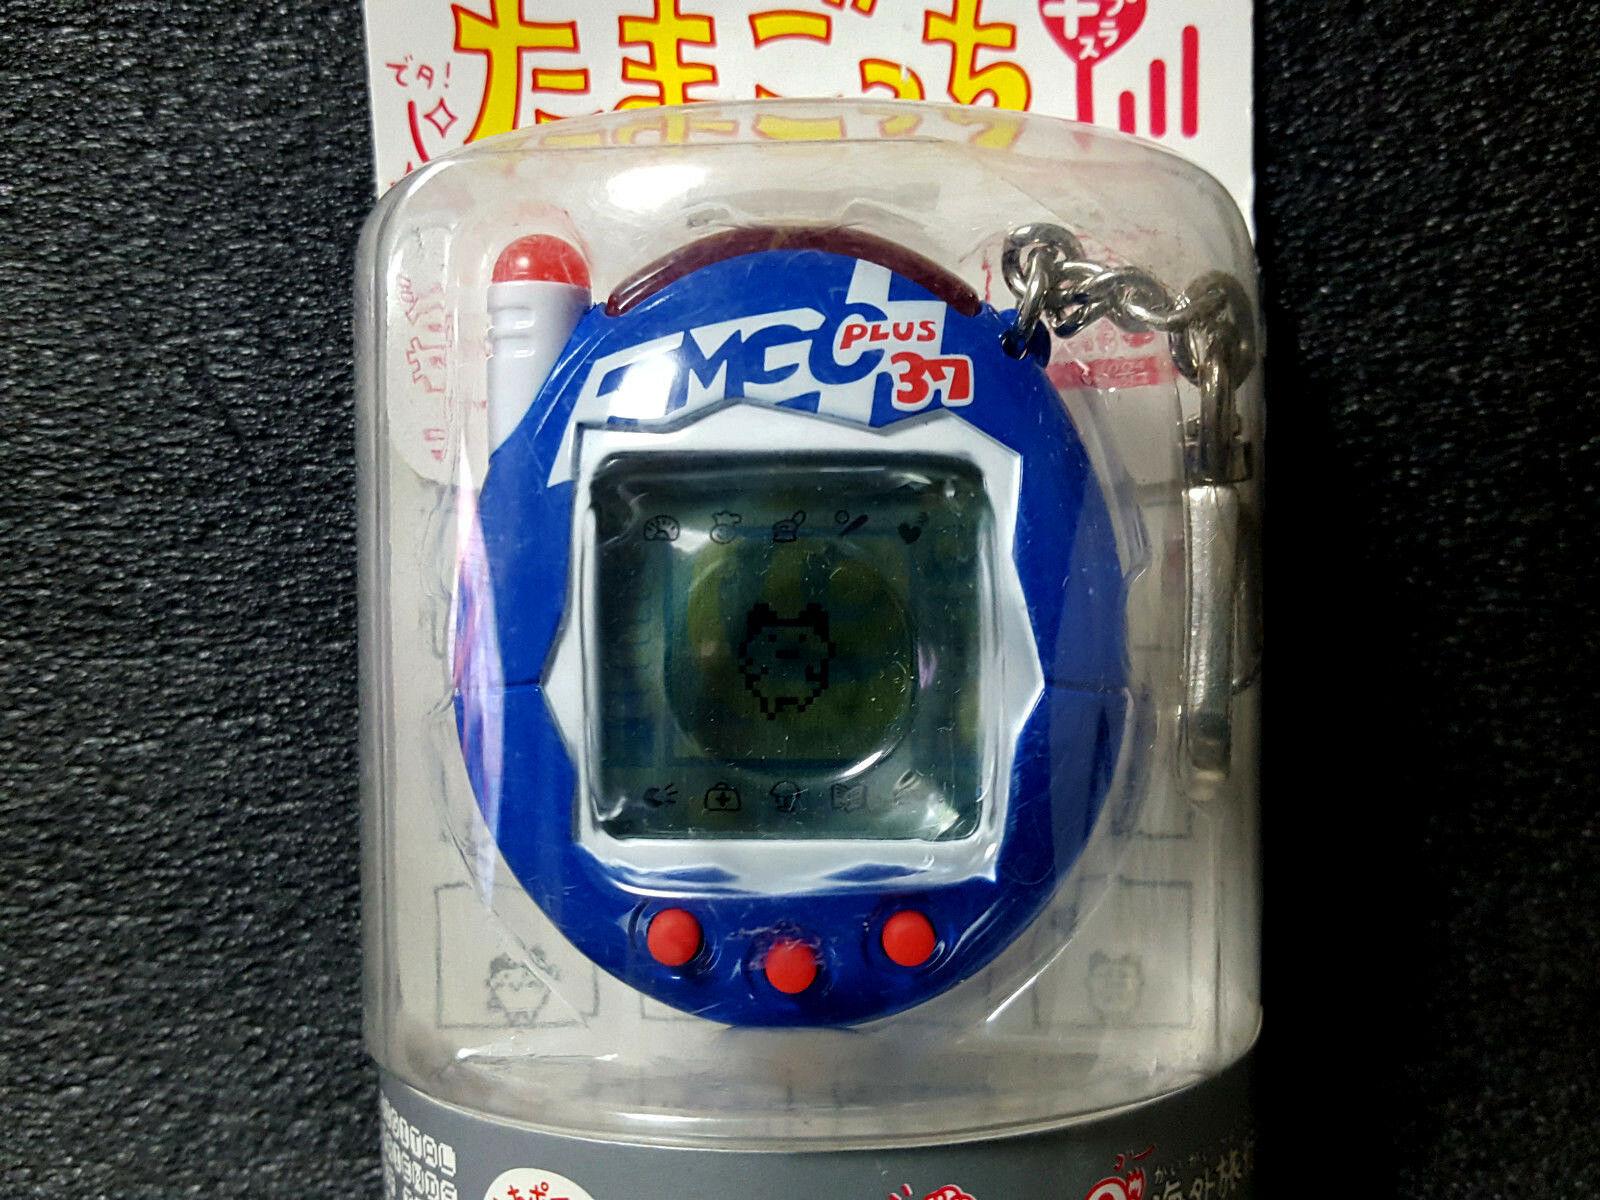 BANDAI Tamagotchi Plus Blue Team TAMAGOTCHI Rare Japan